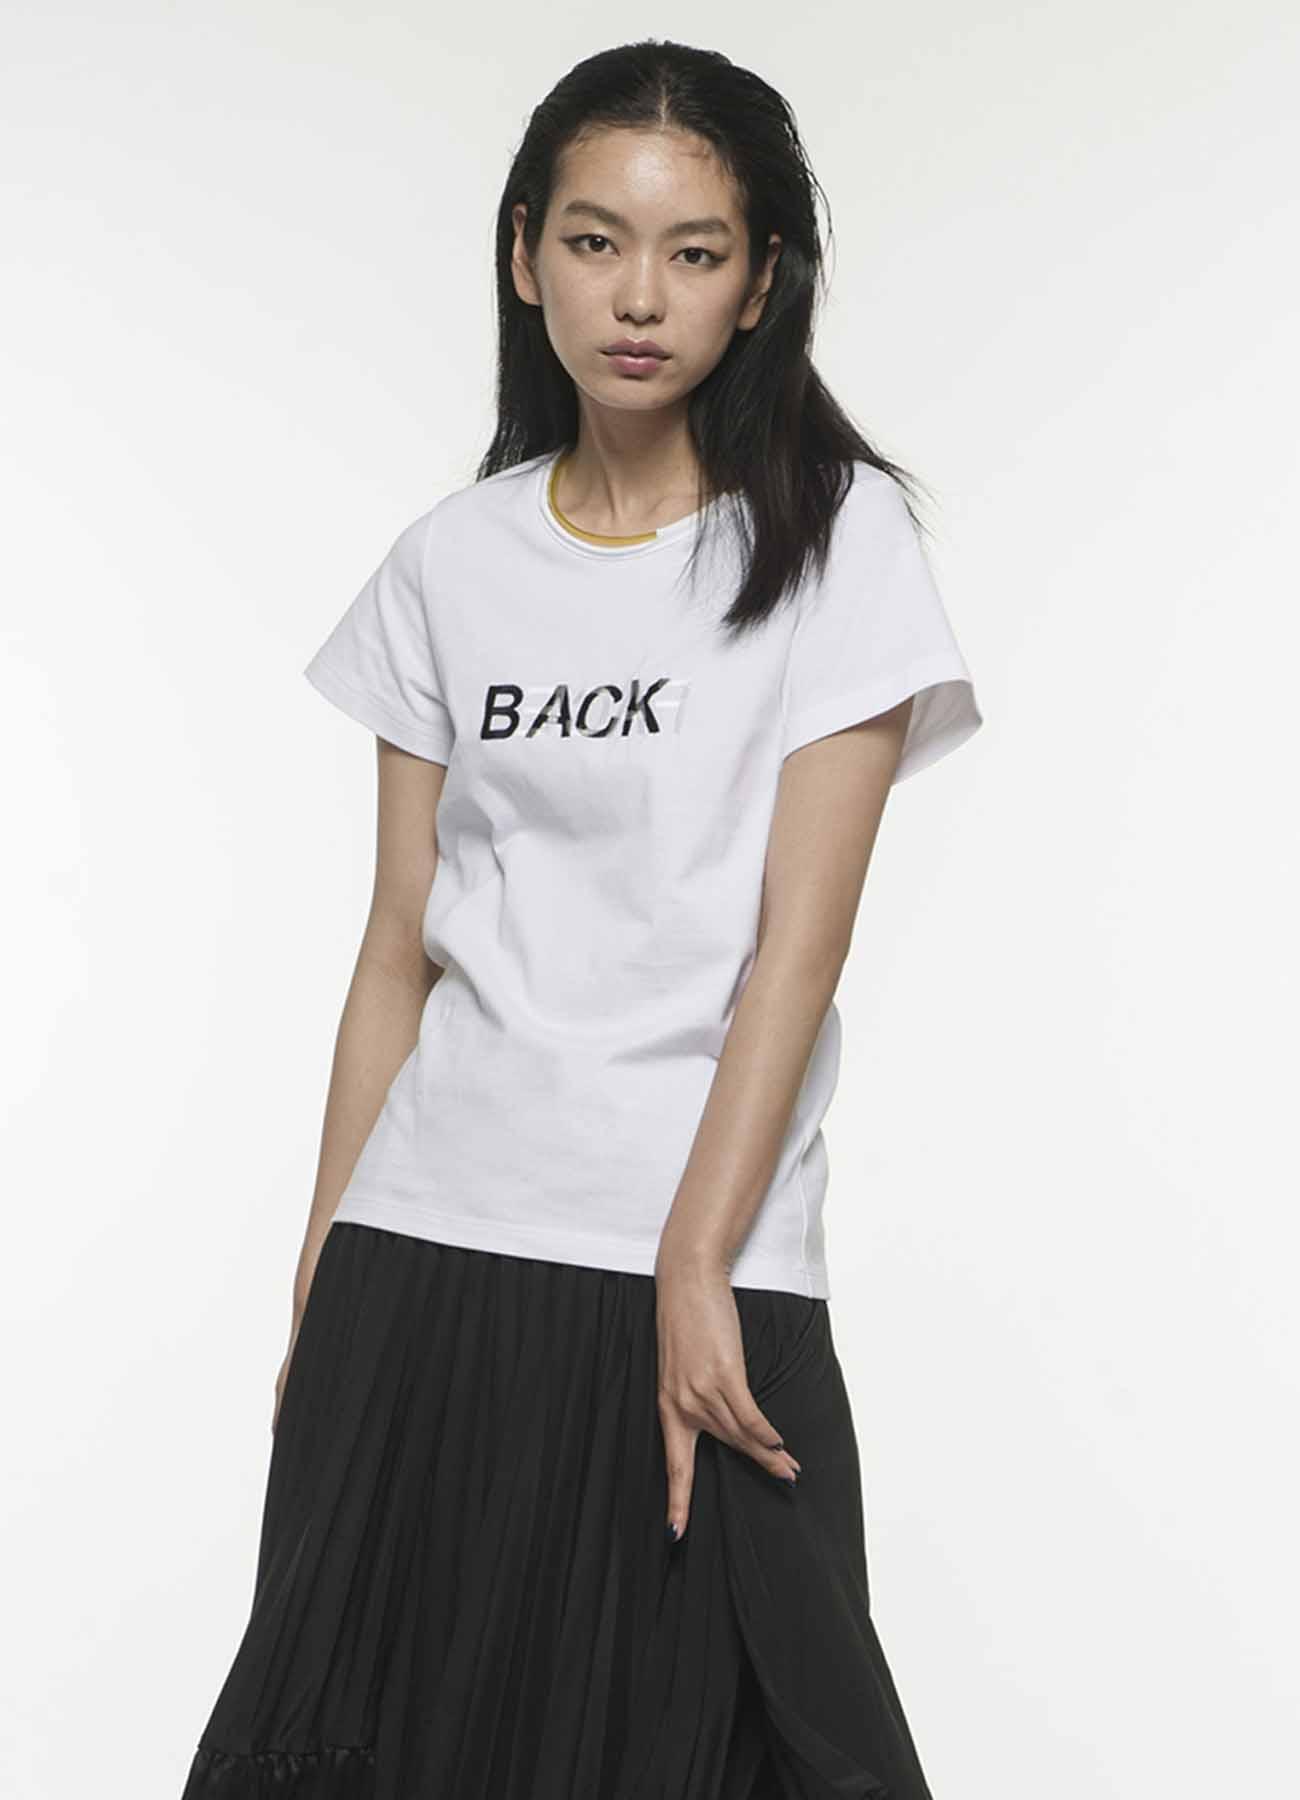 BACK&FACE 刺绣T恤